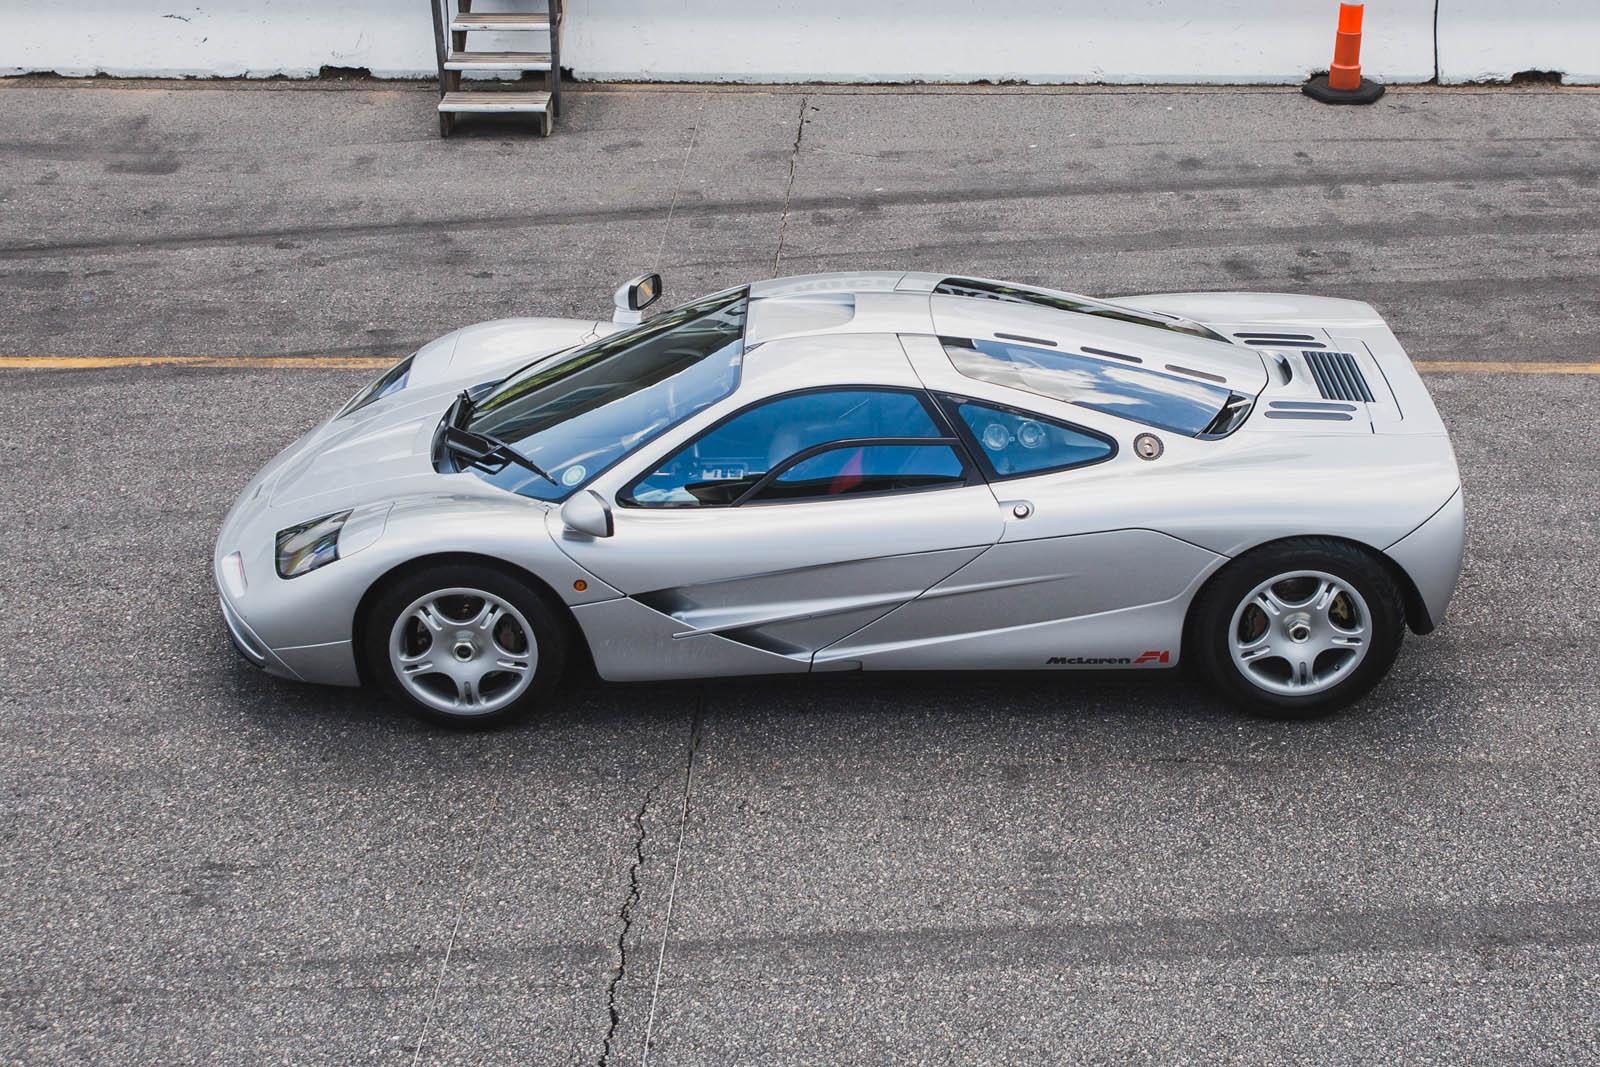 McLaren_F1-11 copy